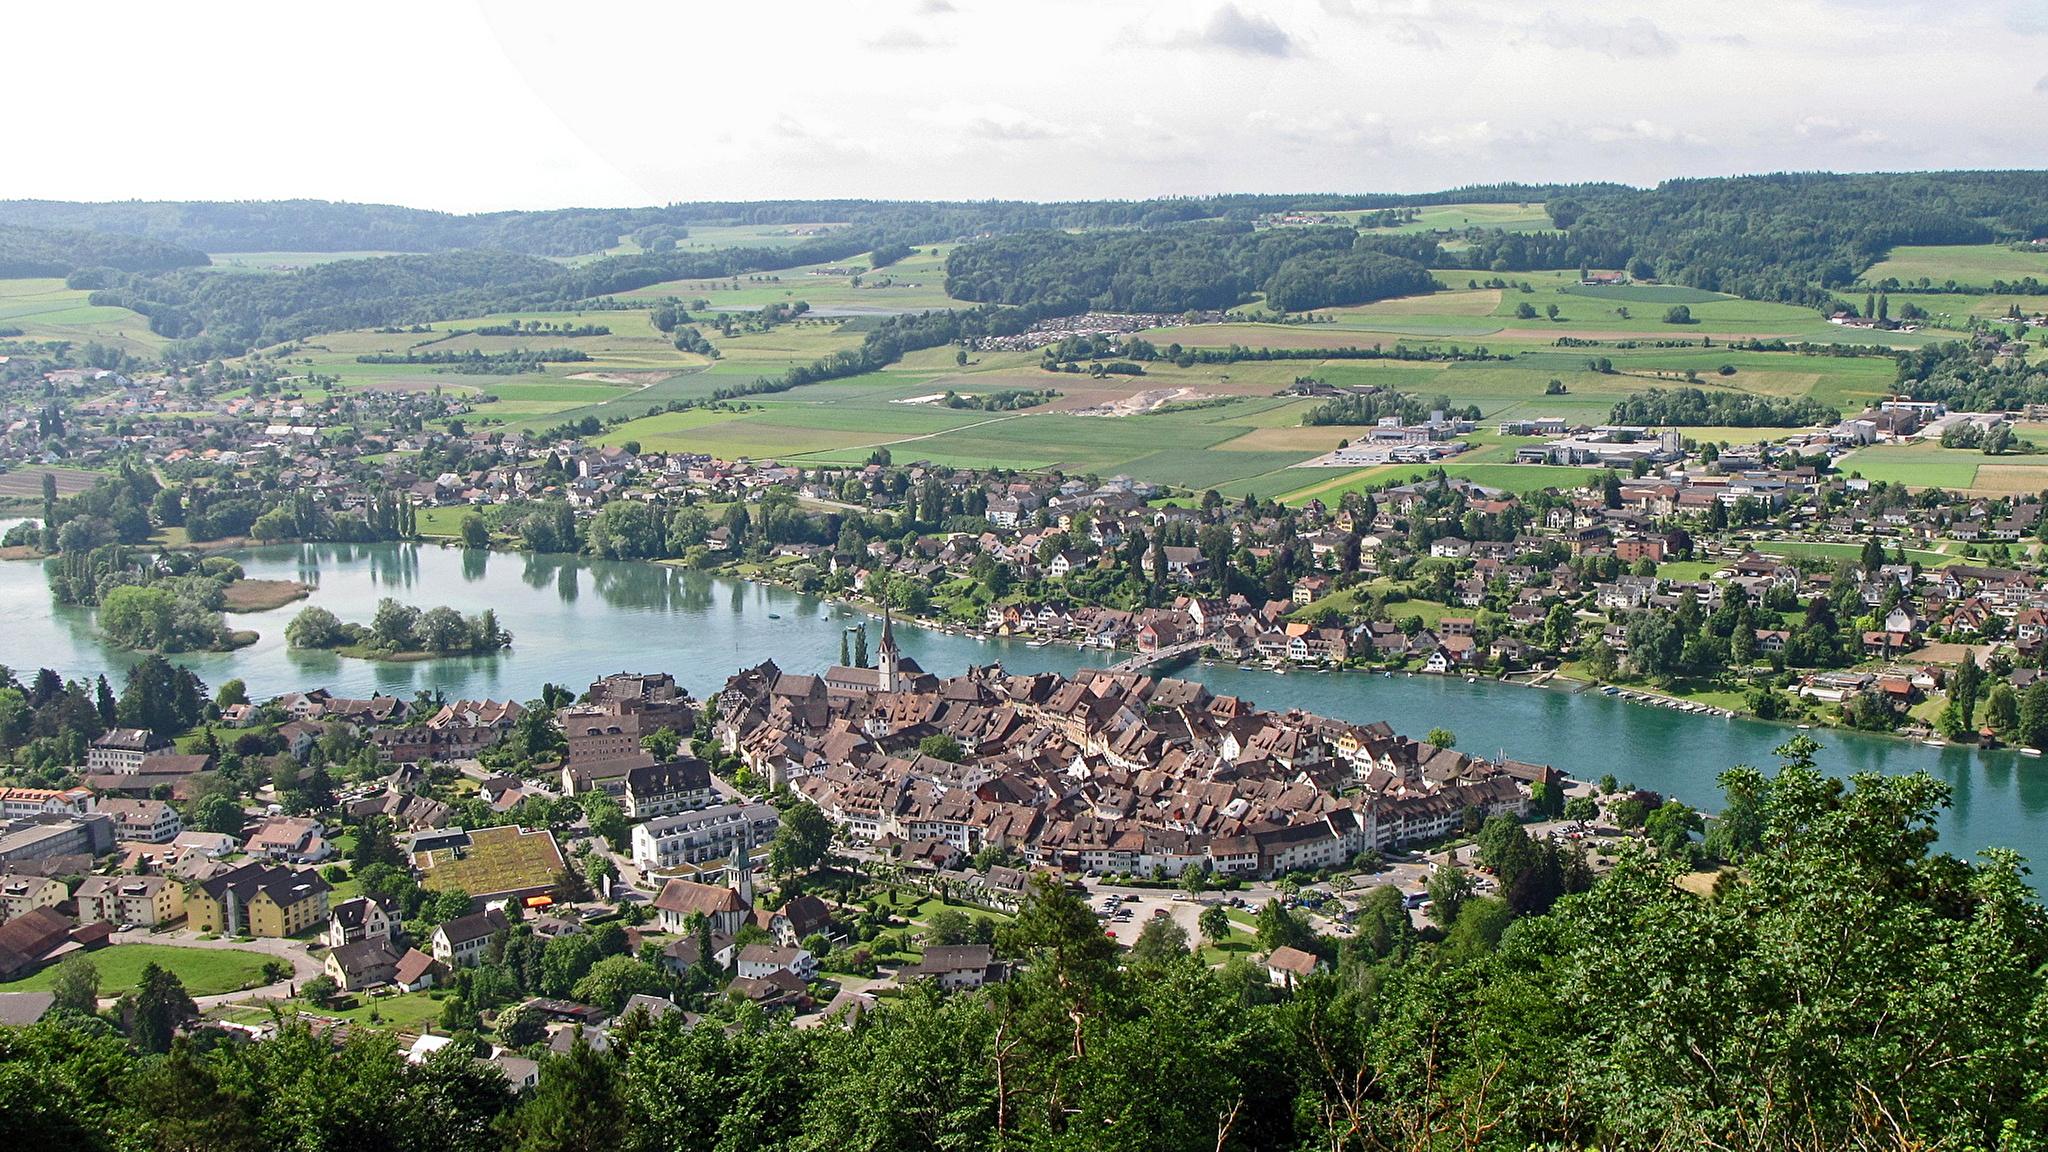 Vineyard at Sunset, Munot Castle, Schaffhausen, Switzerland анонимно